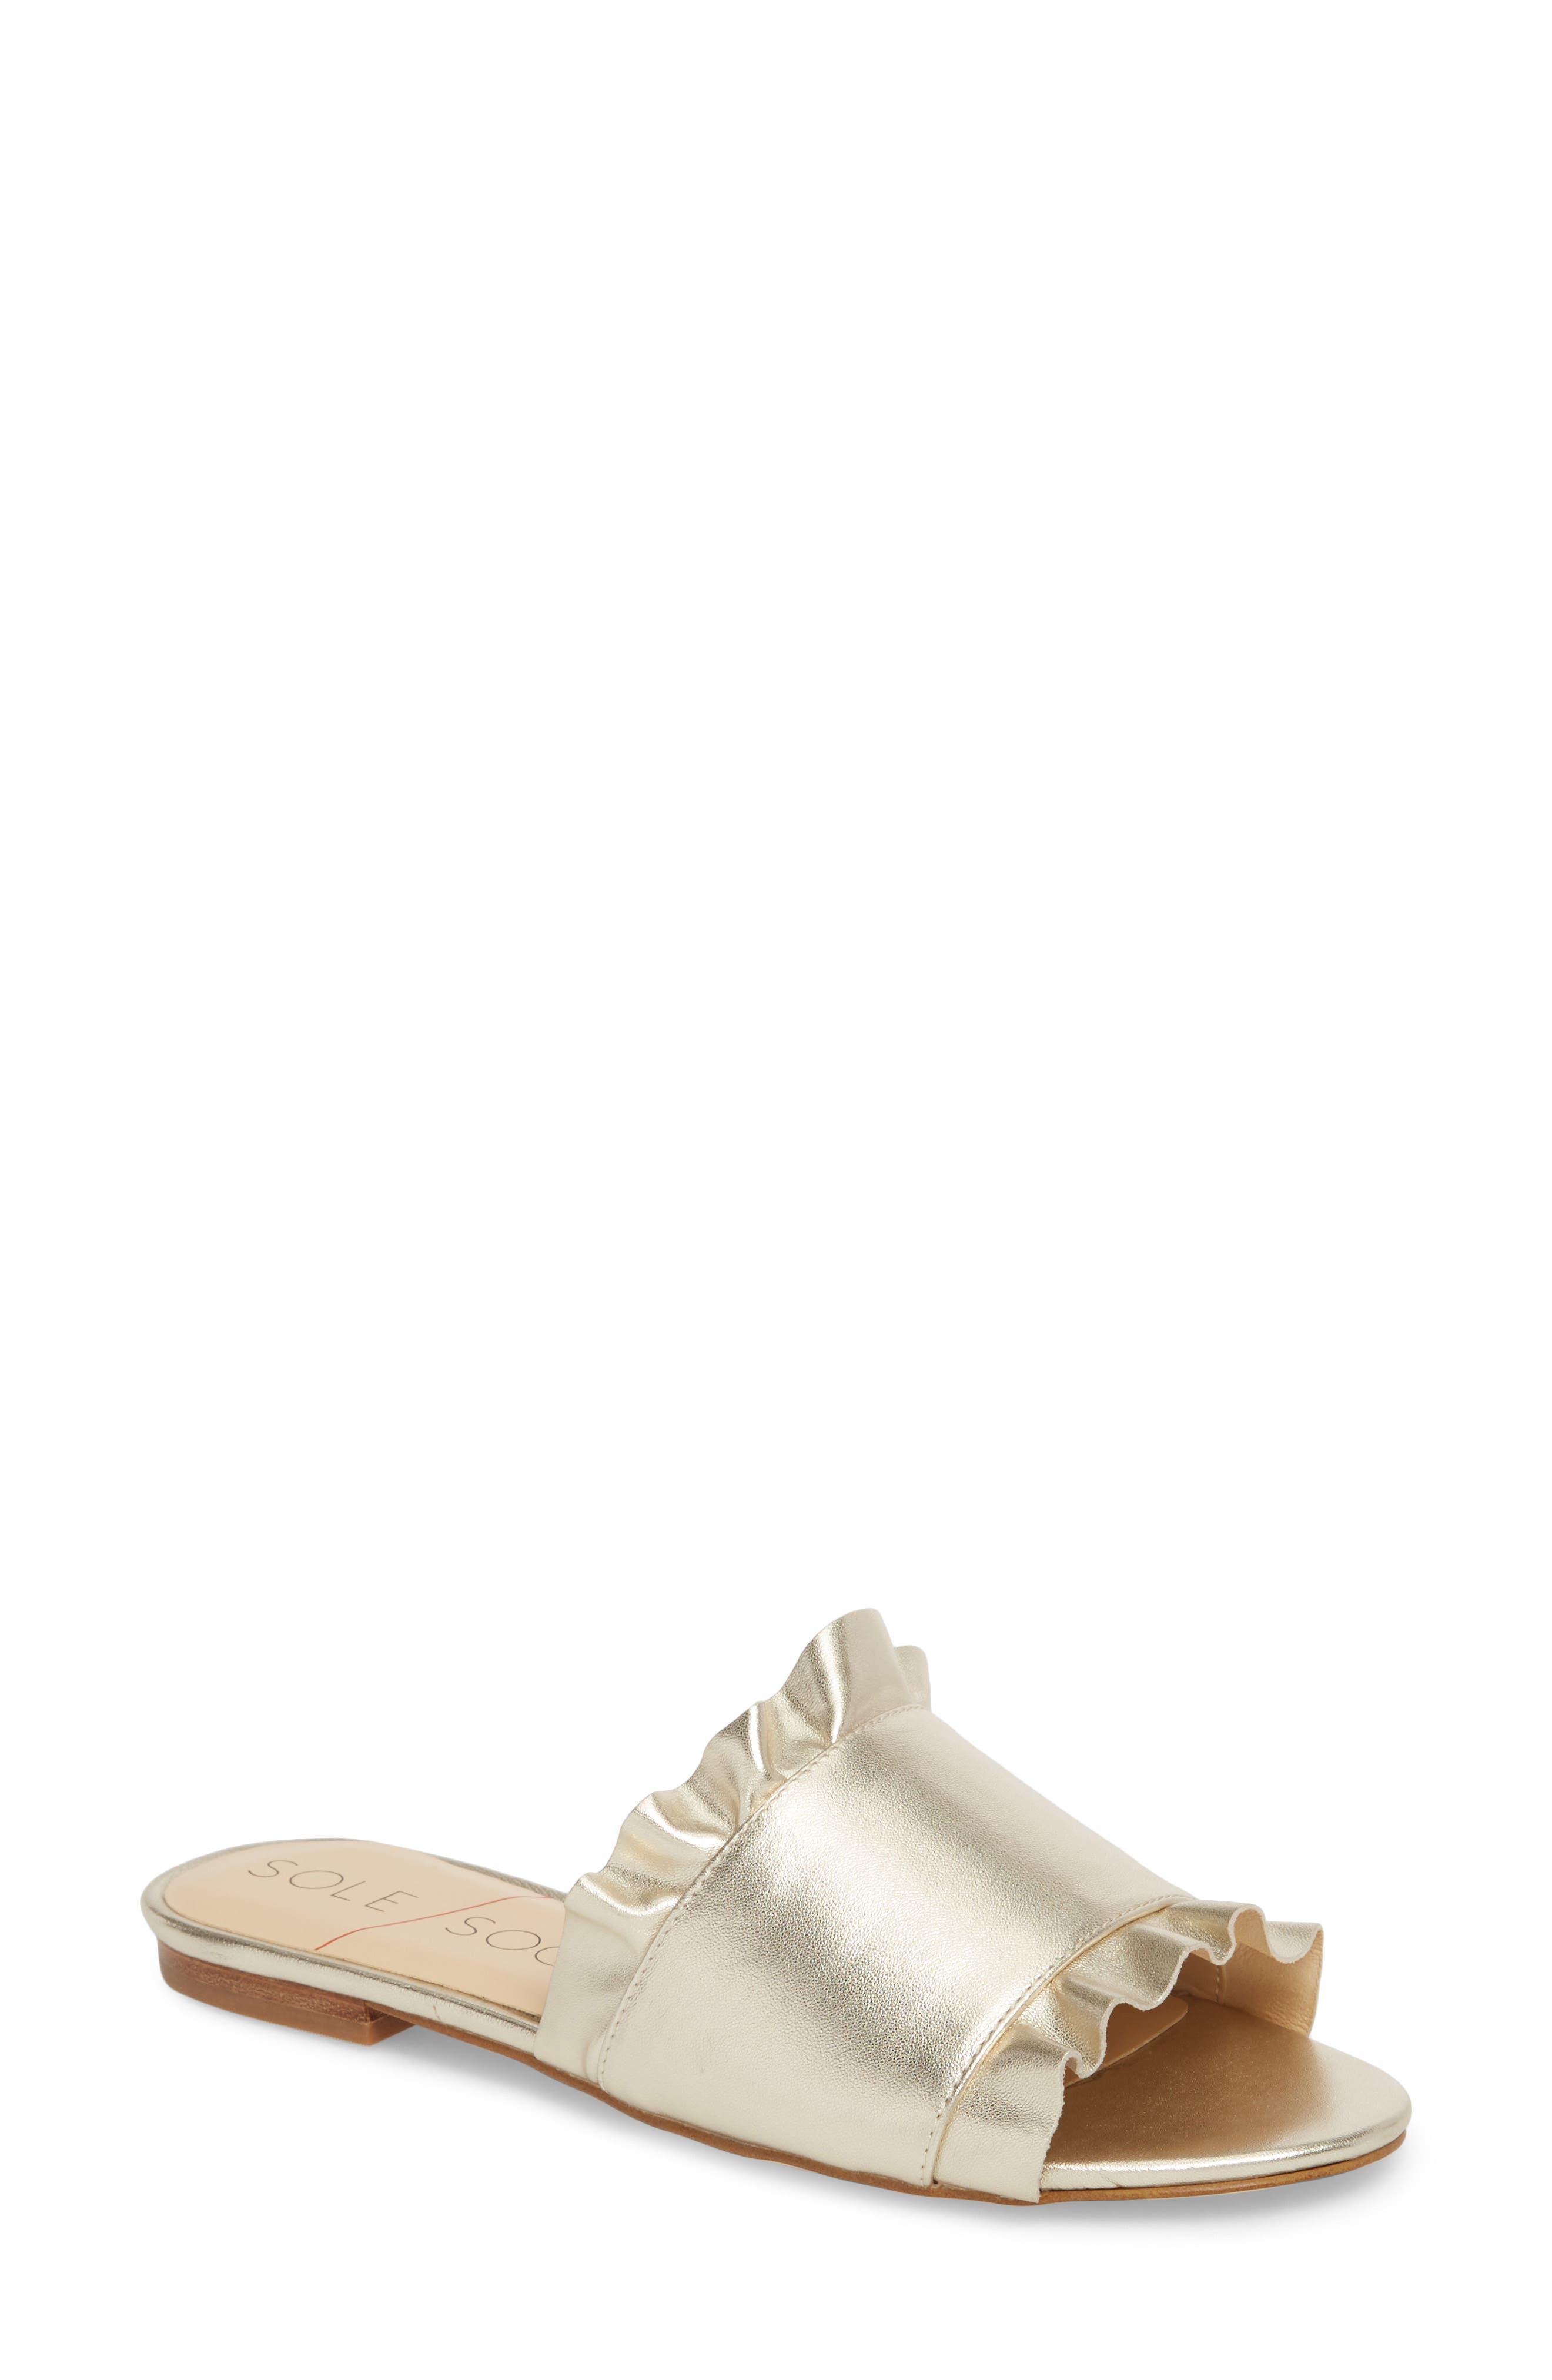 Sole Society So-Madalayne Flat Sandal, Metallic